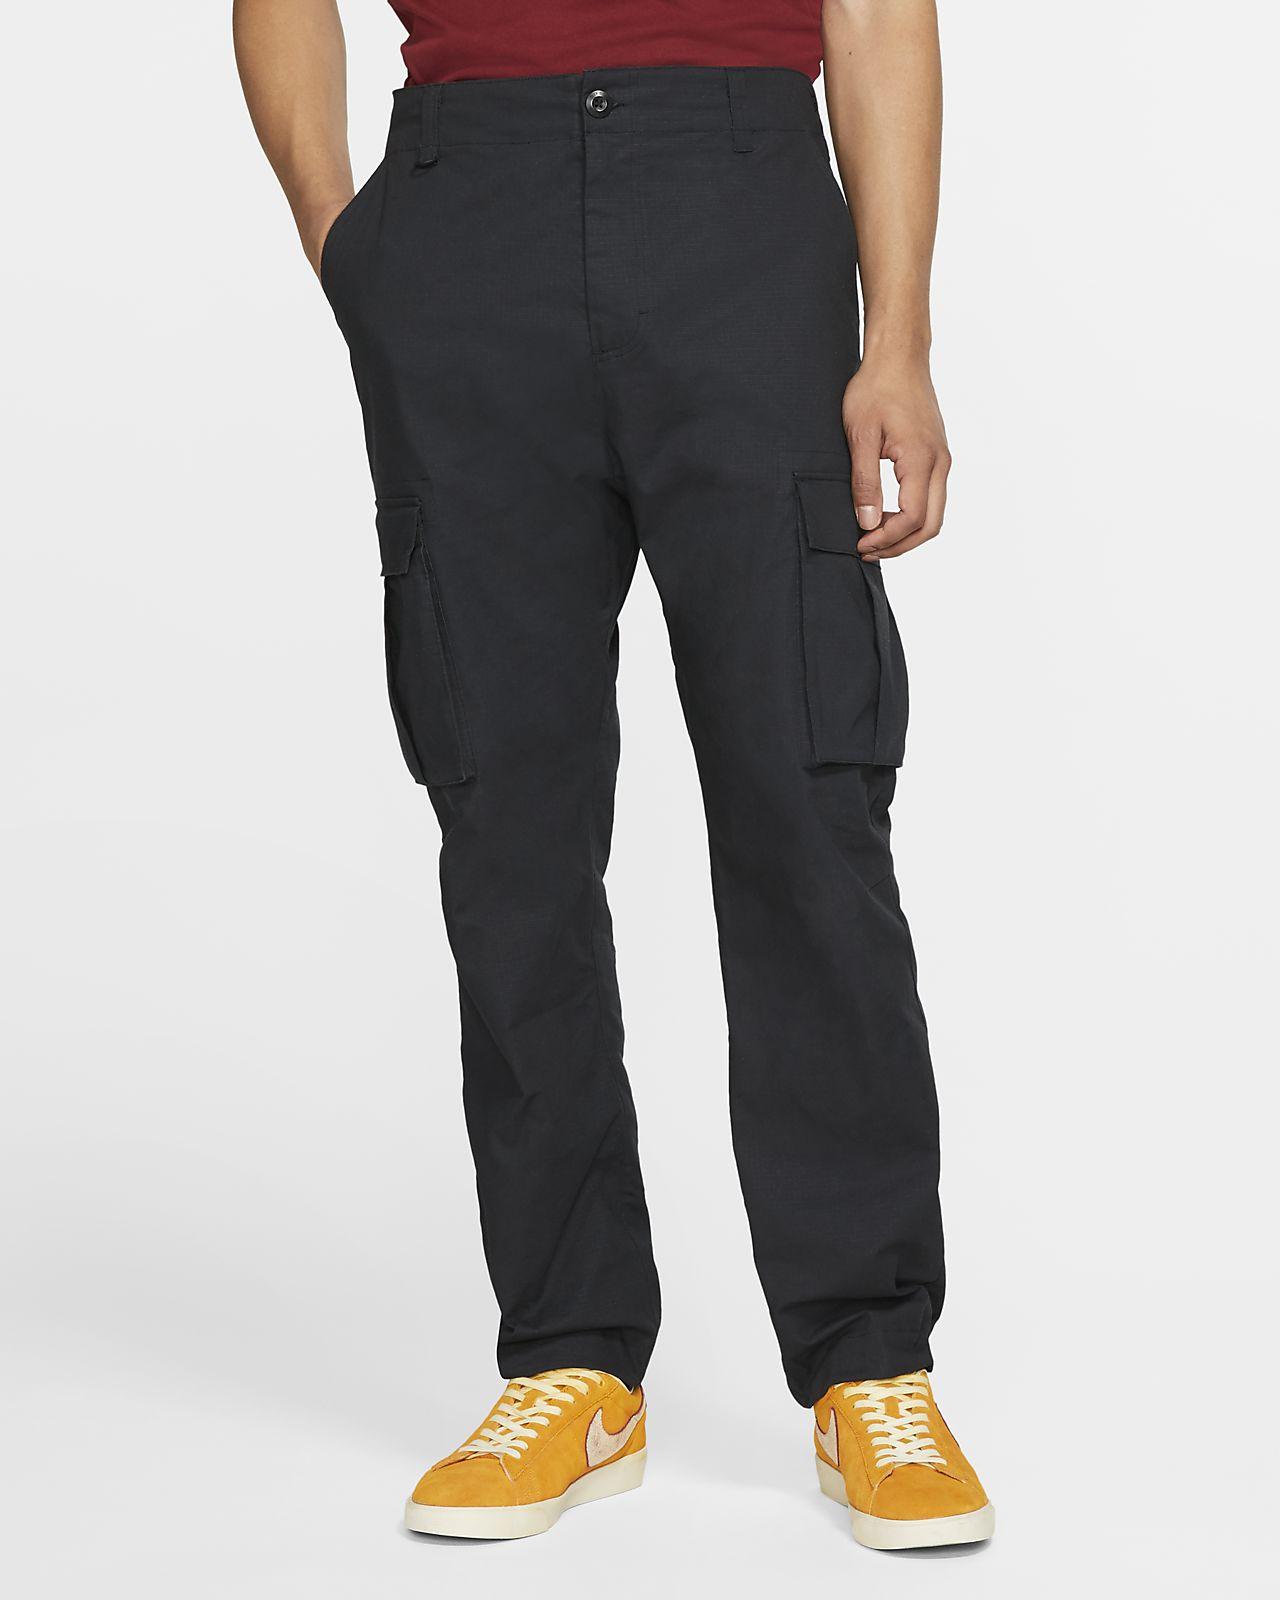 Pantalones de skateboarding para hombre Nike SB Flex FTM